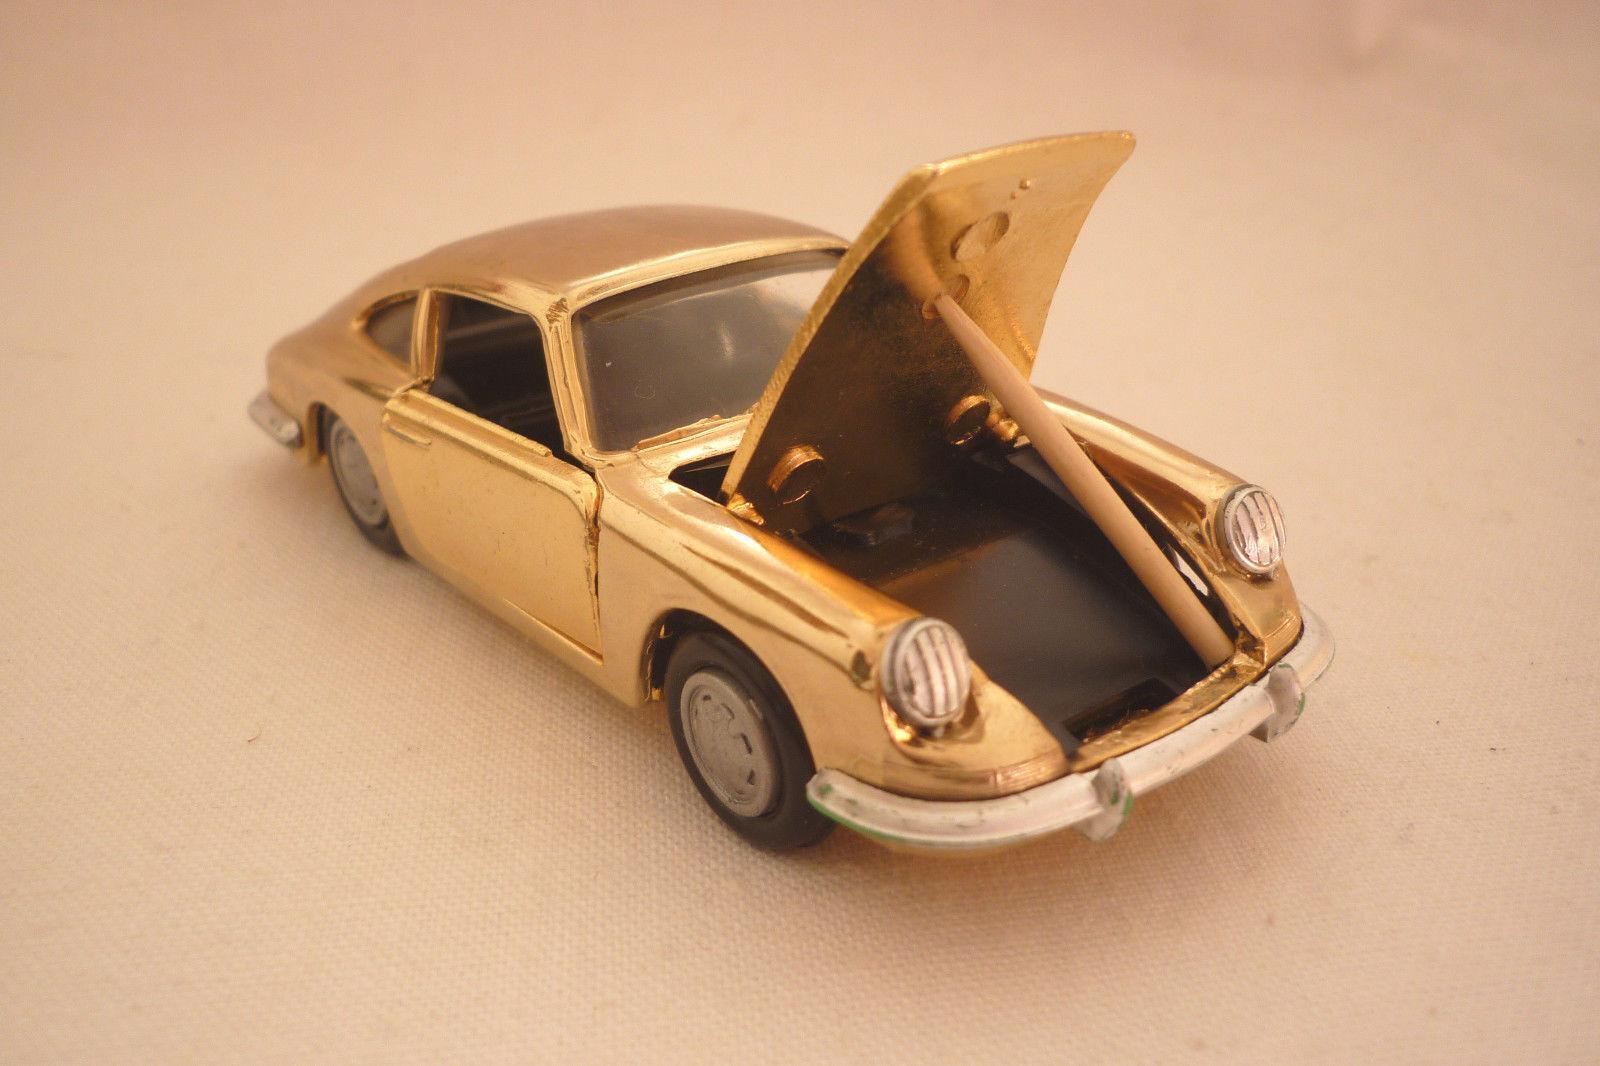 GAMA - MODELL - PORSCHE 911 - - - GoldFARBEN 1 42 - (3.DIV-29) 07a904